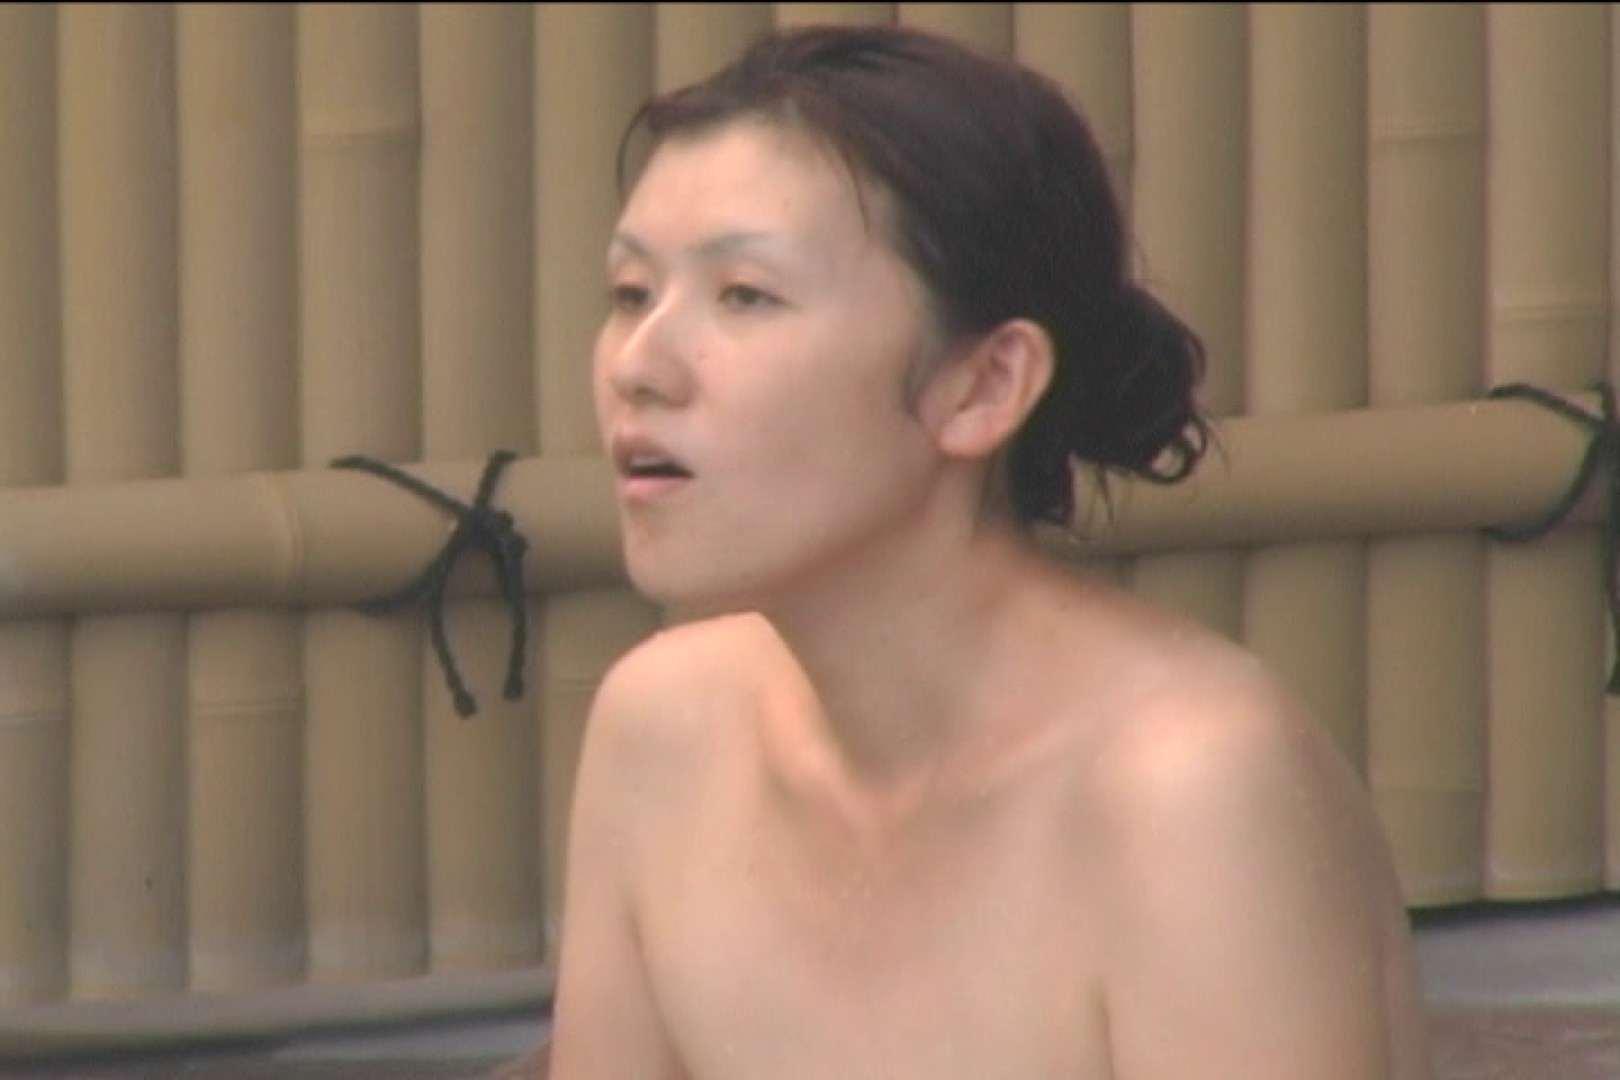 Aquaな露天風呂Vol.532 OLセックス 盗撮ワレメ無修正動画無料 105画像 29